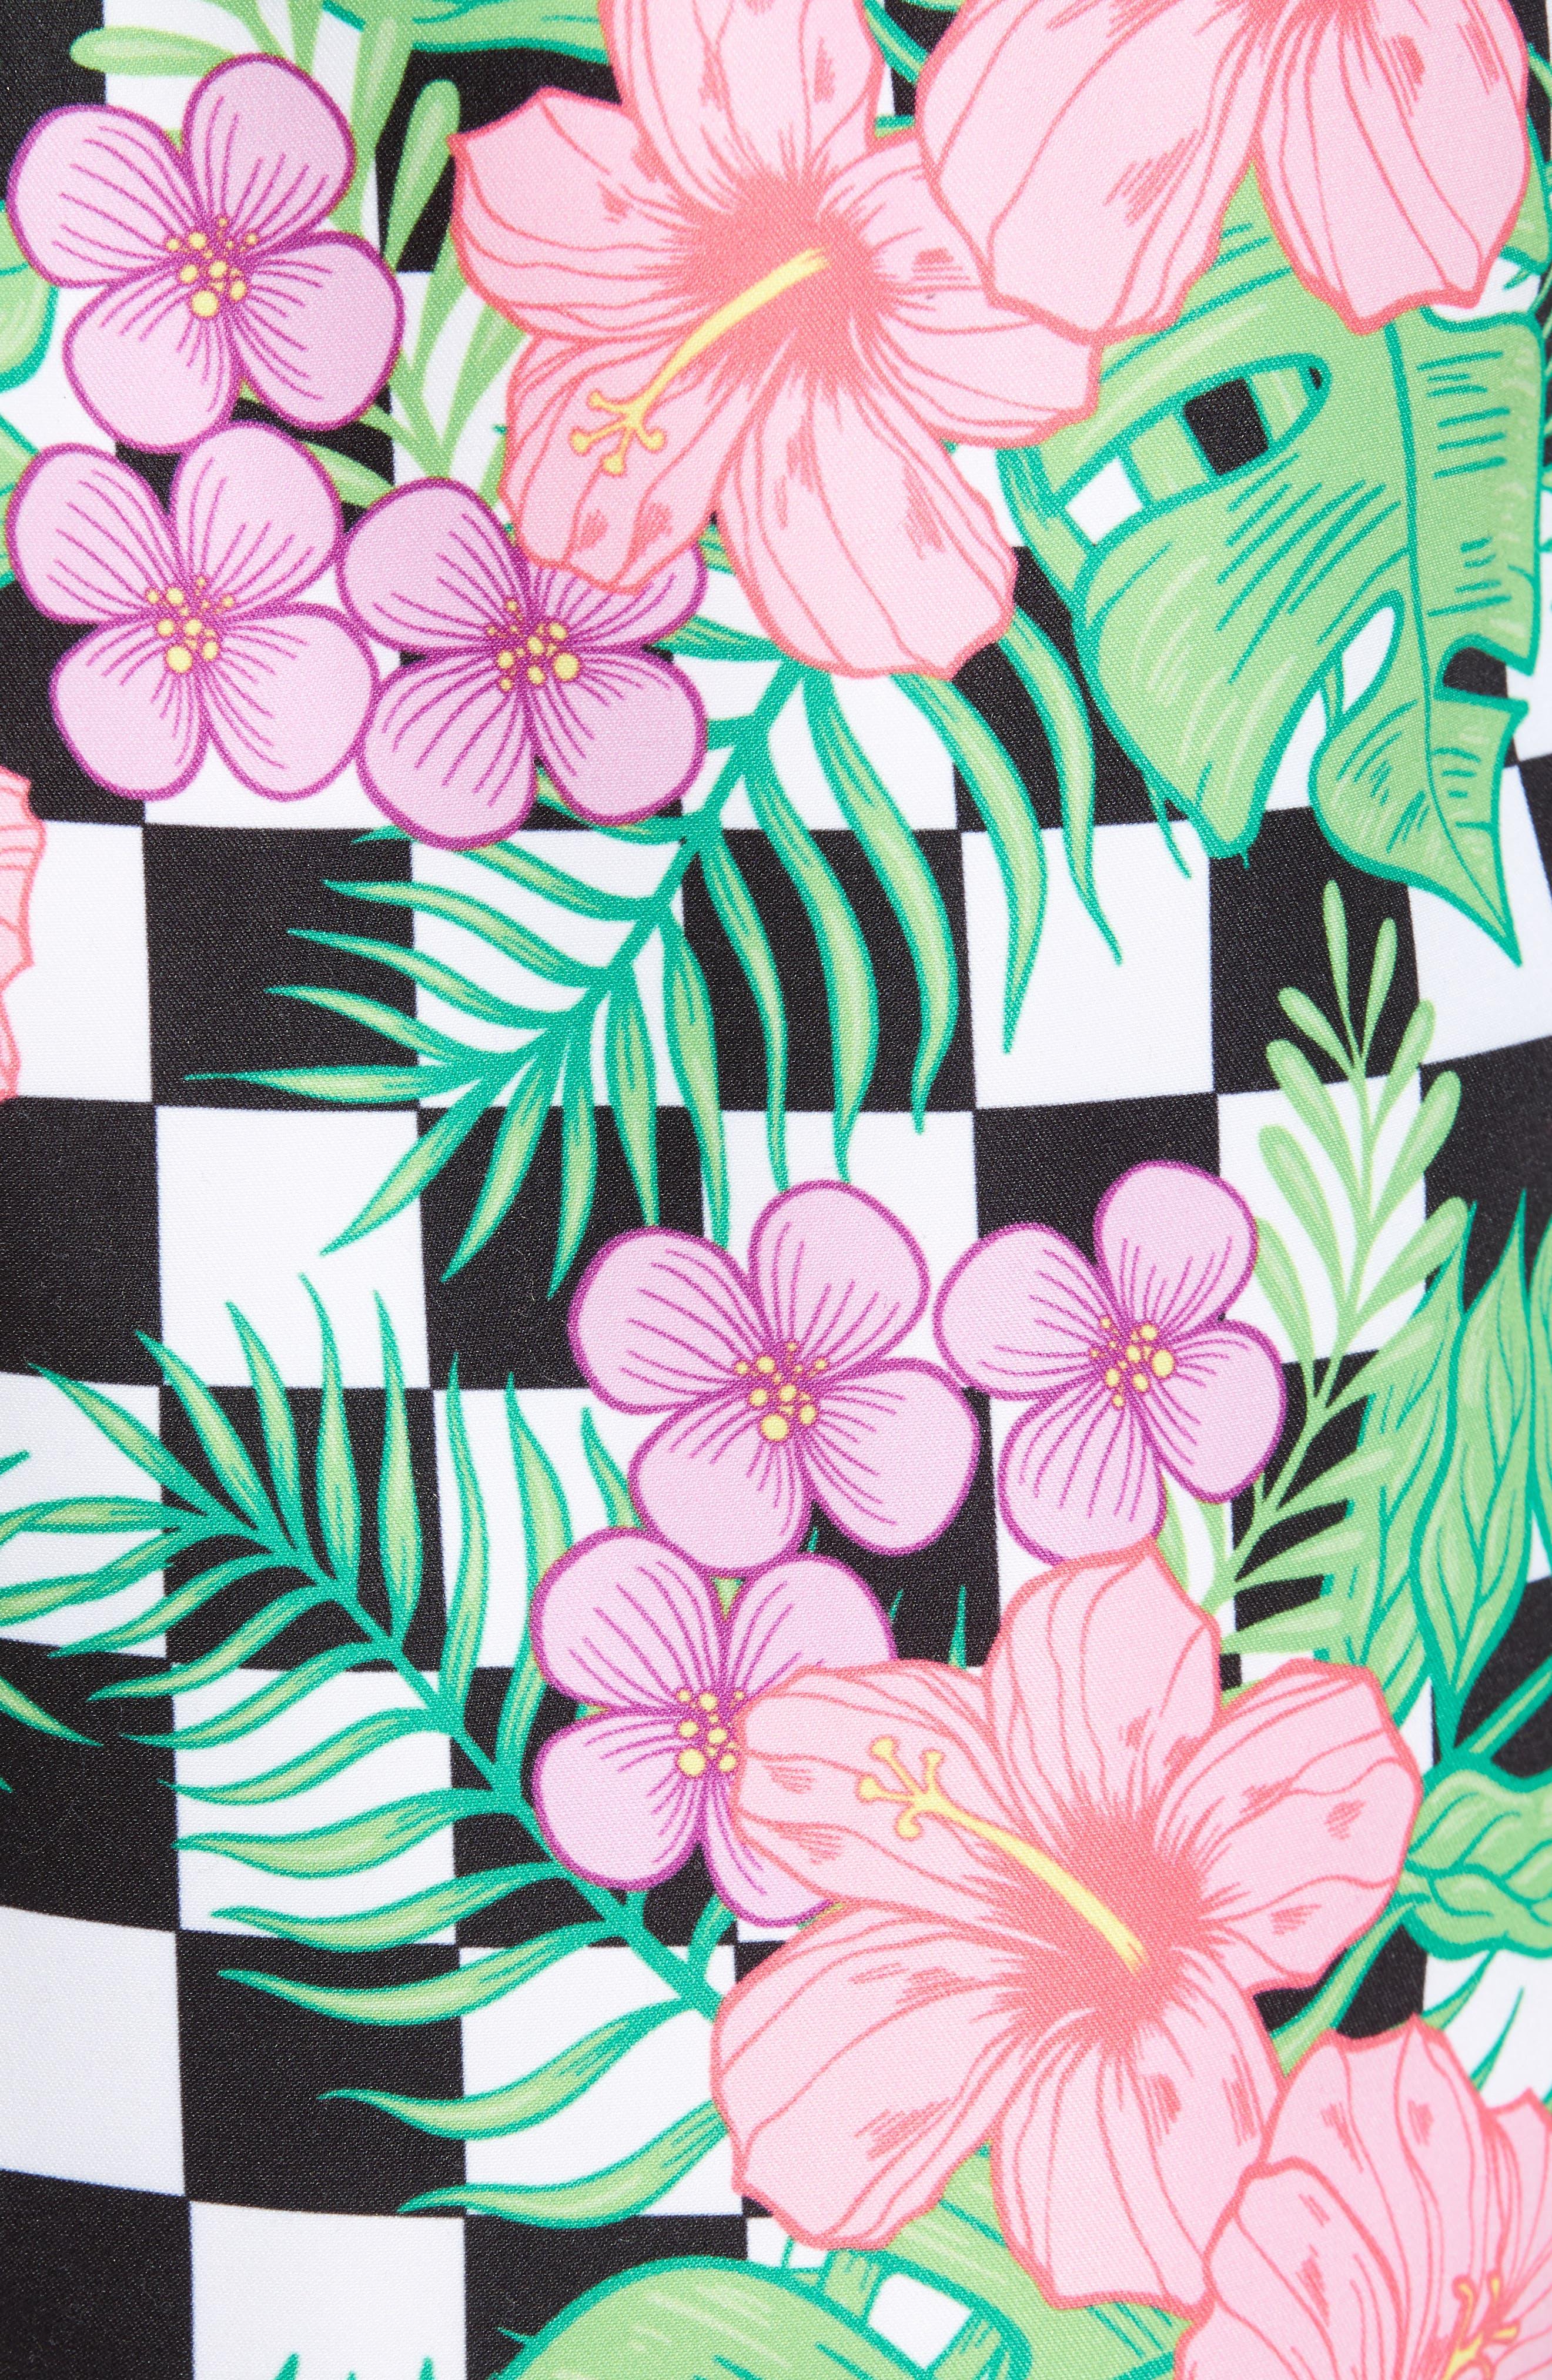 Checkerboard Floral Print Swim Trunks,                             Alternate thumbnail 5, color,                             MULTI